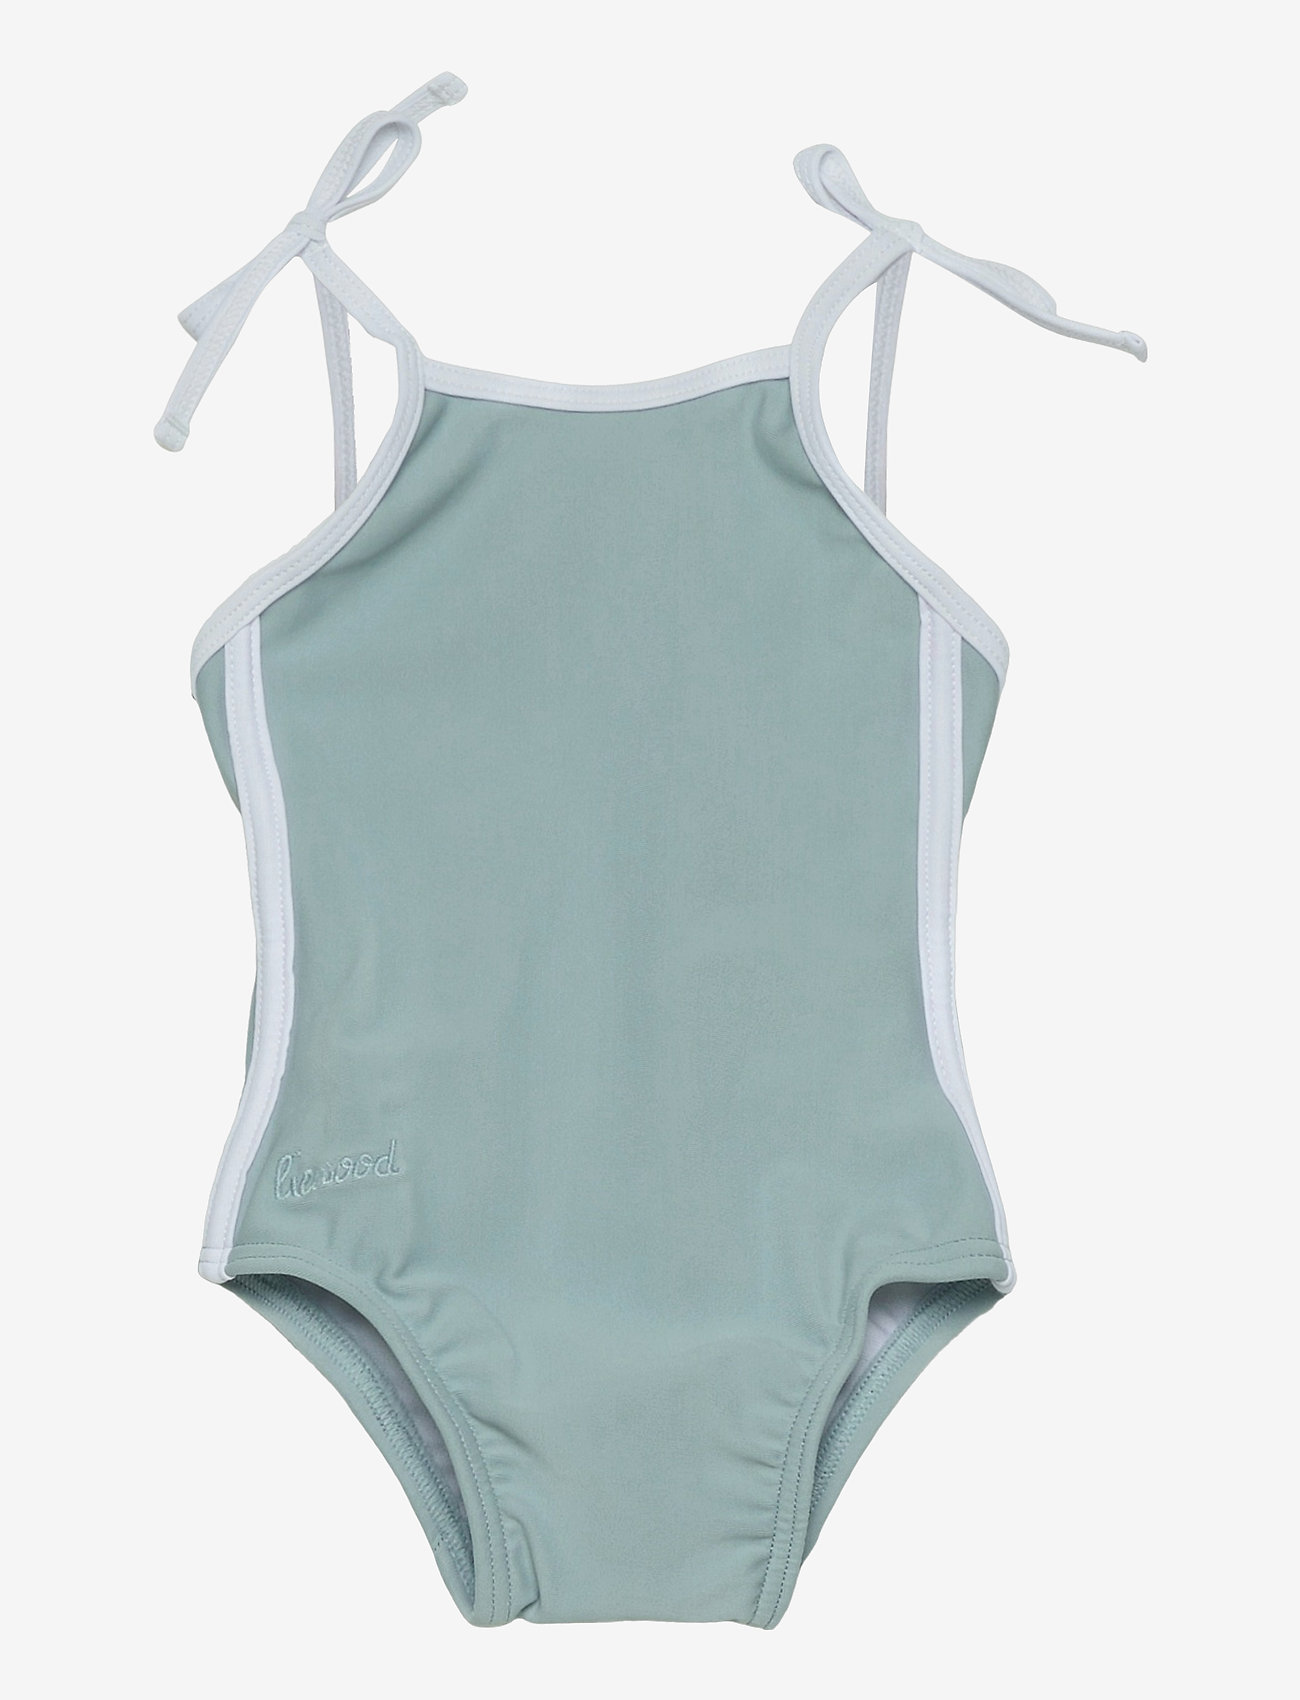 Liewood - Gigi swimsuit - swimsuits - sea blue - 0